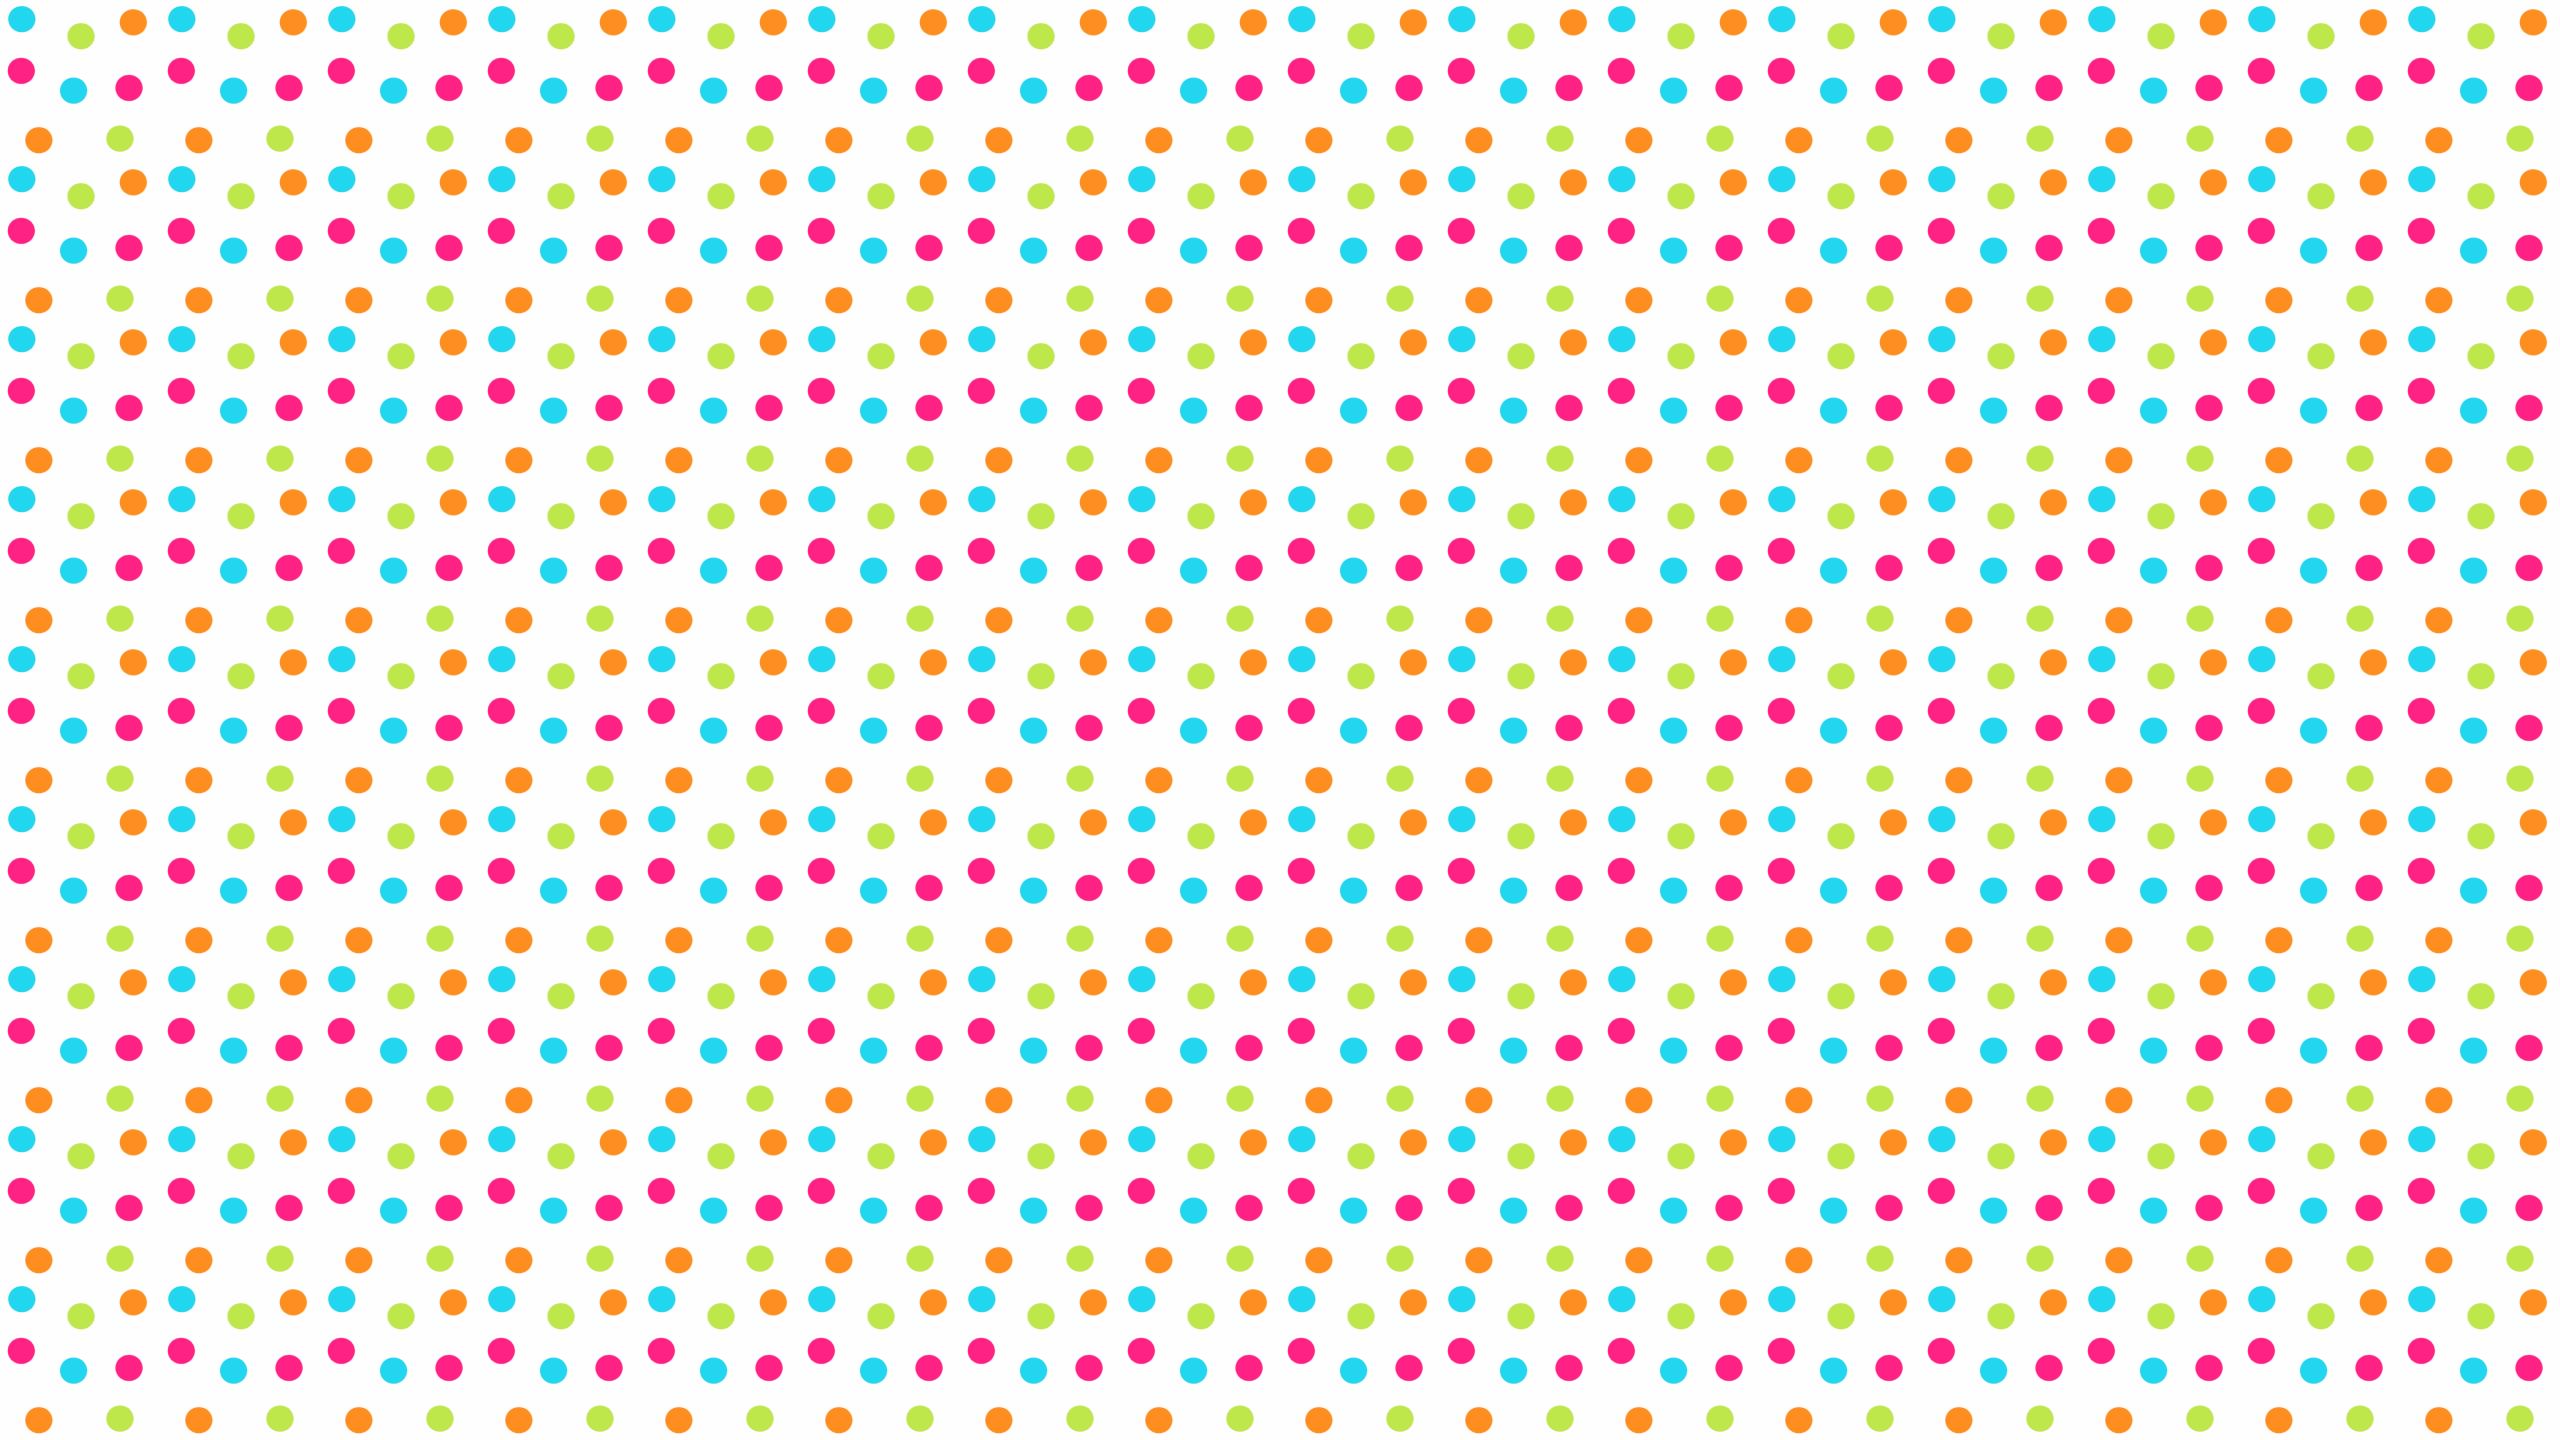 polka dot wallpapers wallpapersafari